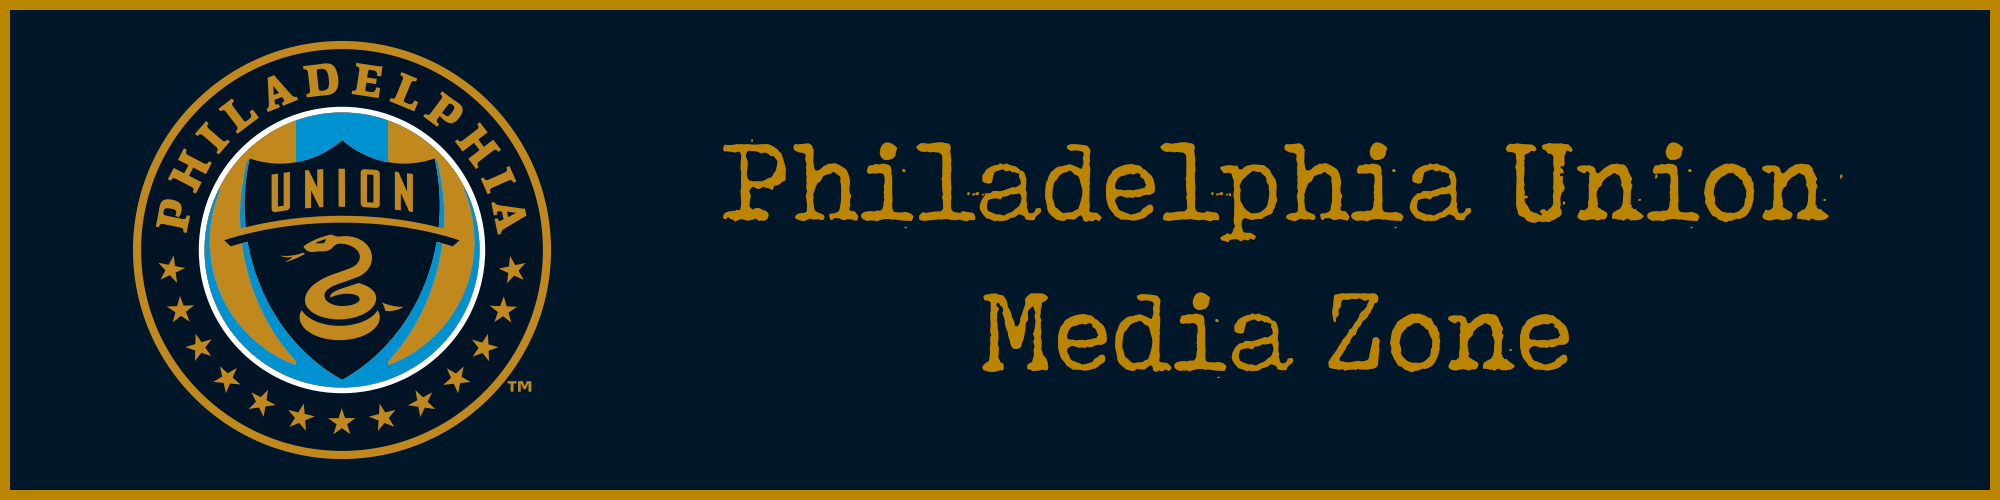 PHILADELPHIA UNION COMMUNICATIONS CONTACTS - Logo Philadelphia Union PNG